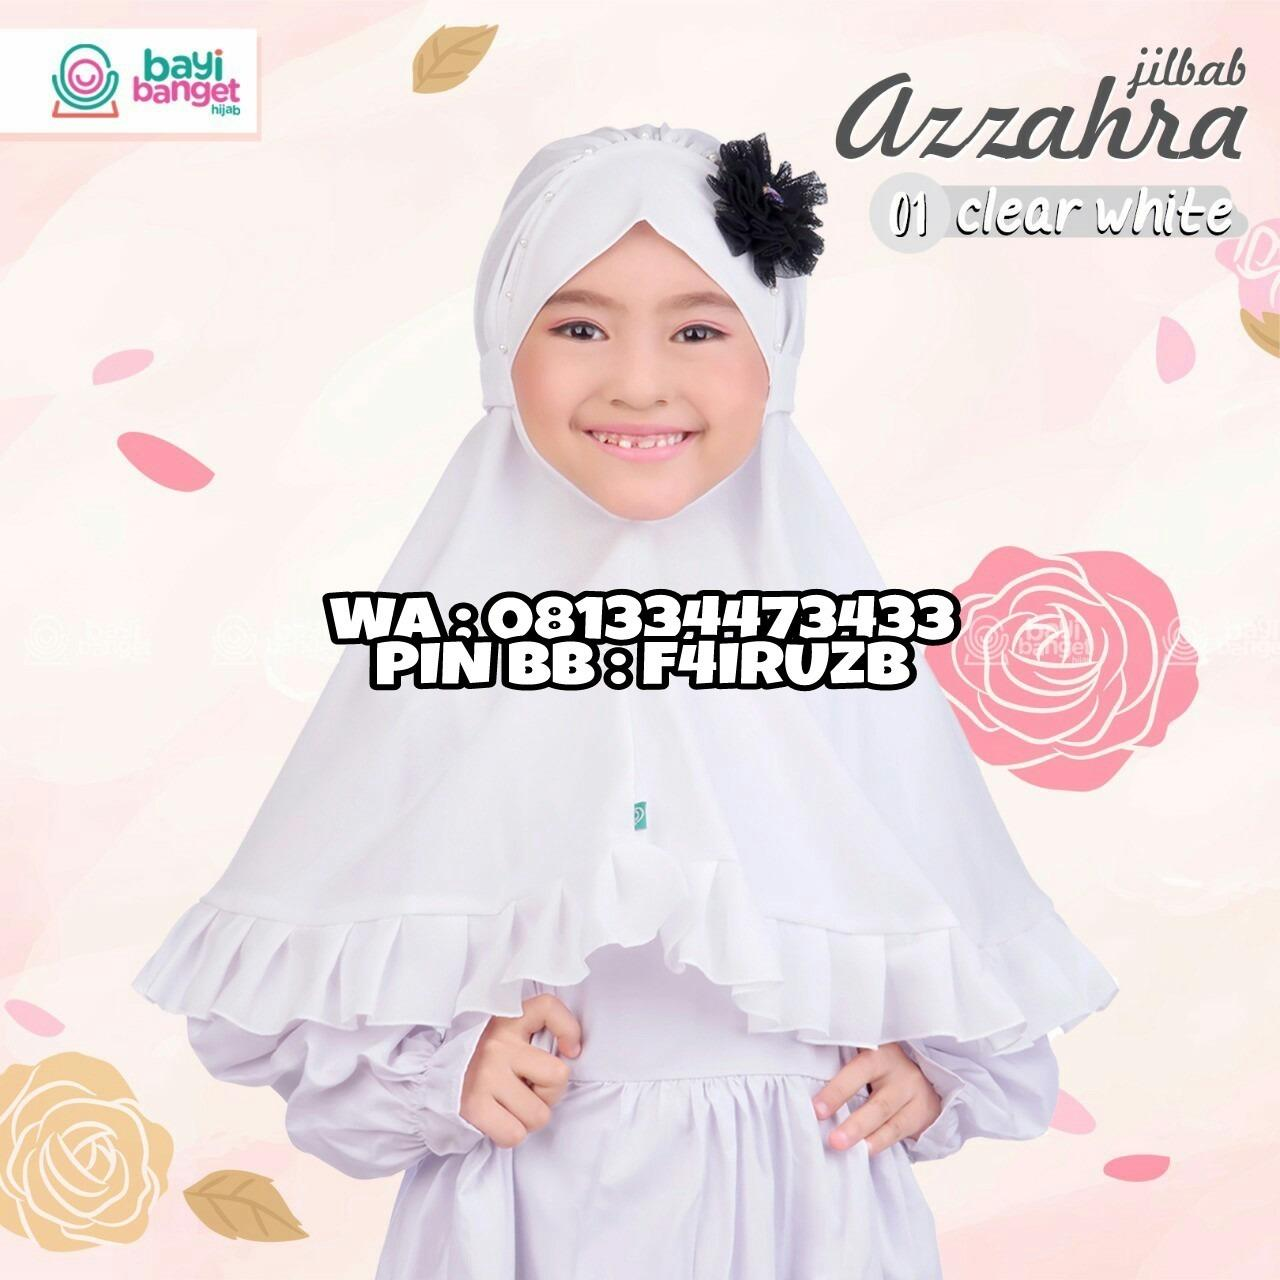 Fairuz Hijab, Jilbab Anak Perempuan, Hijab Instan Murah tali Belakang, Kerudung Anak Bayi warna Putih